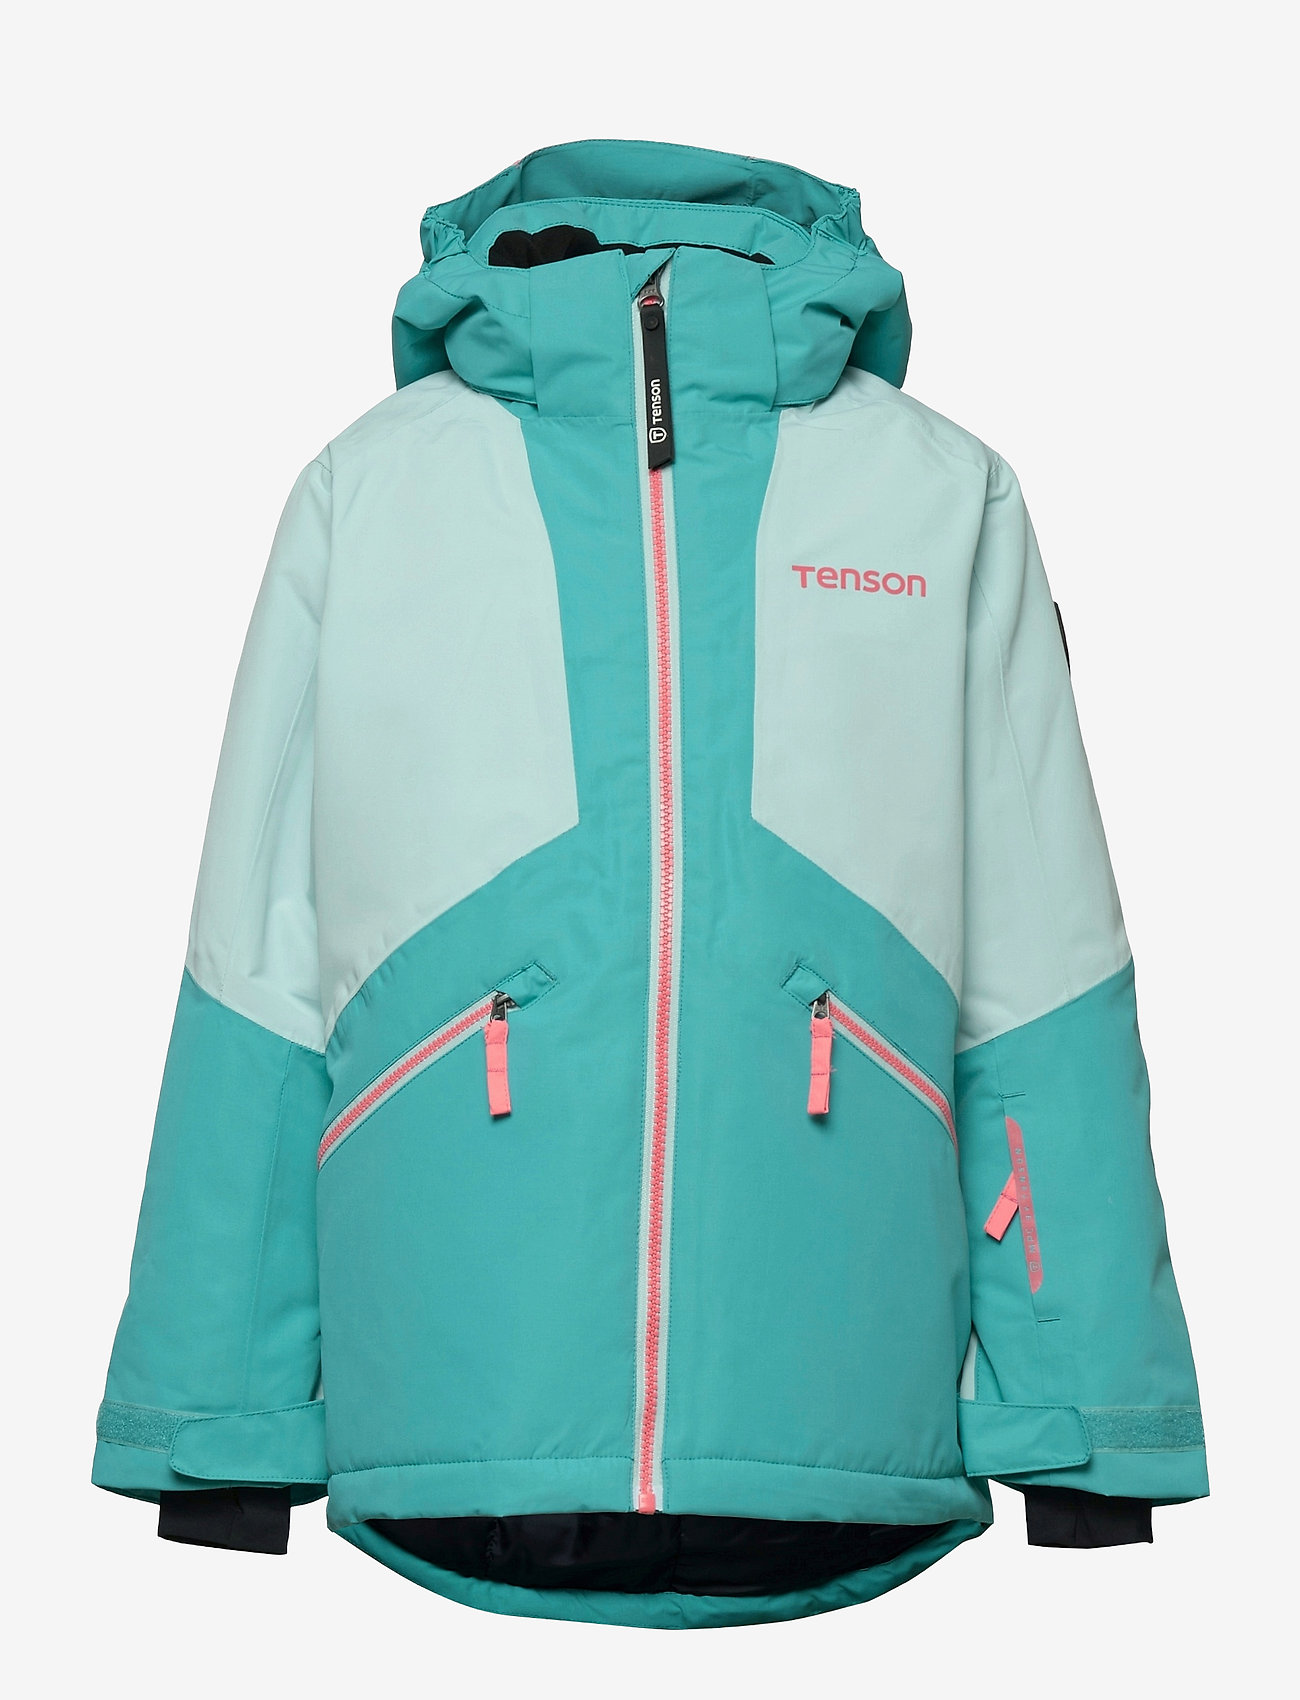 Tenson - Sparks - winterjassen - light turquoise - 0